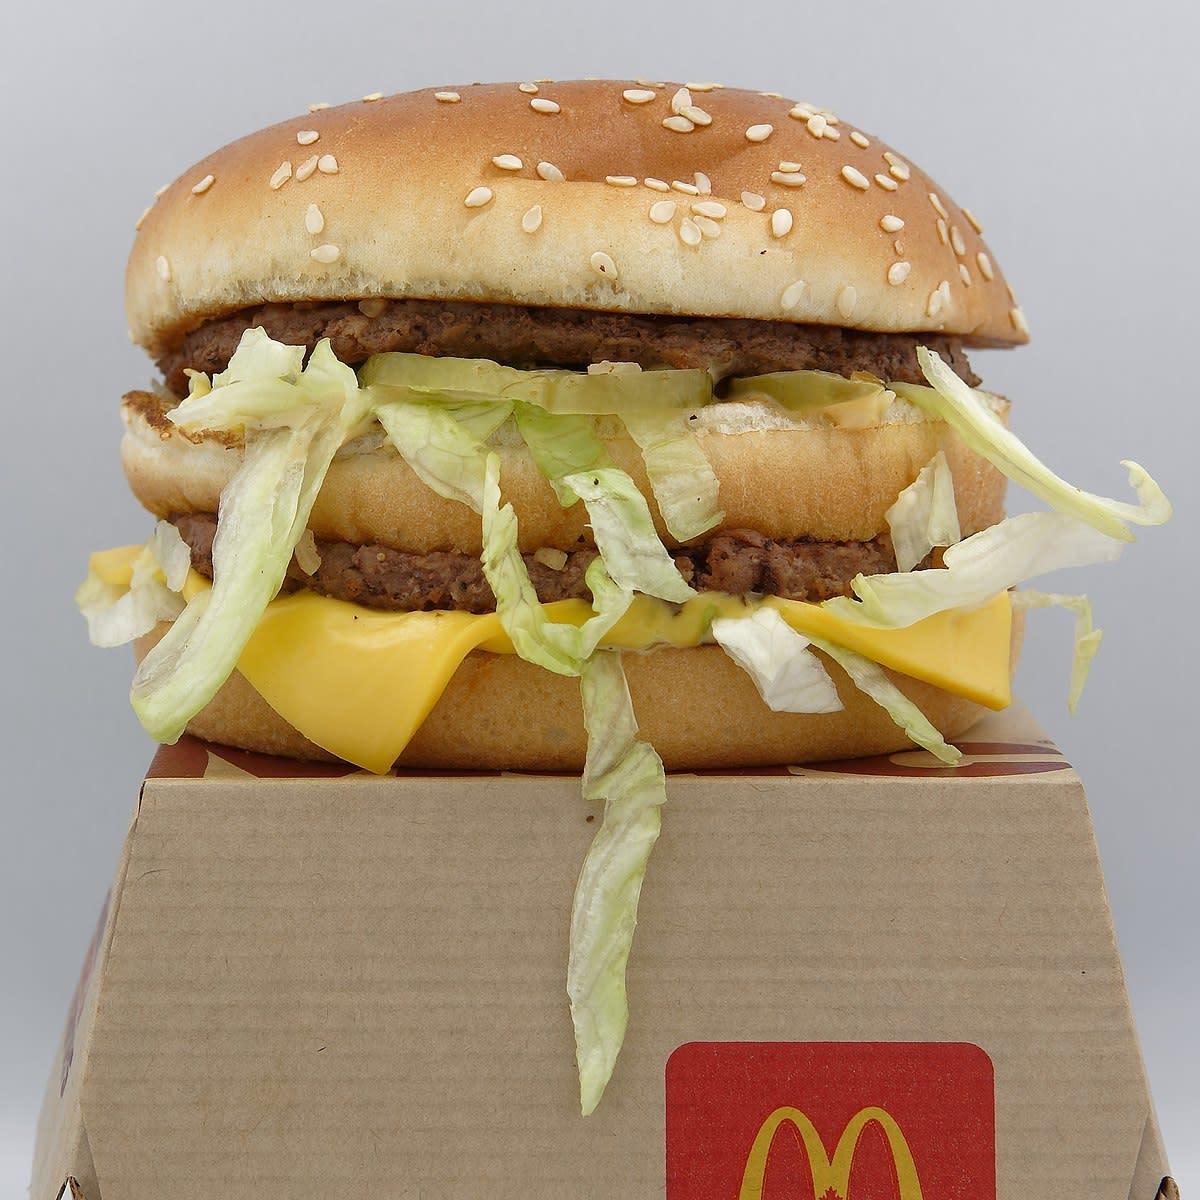 In 1968, McDonald's introduced the legendary Big Mac.